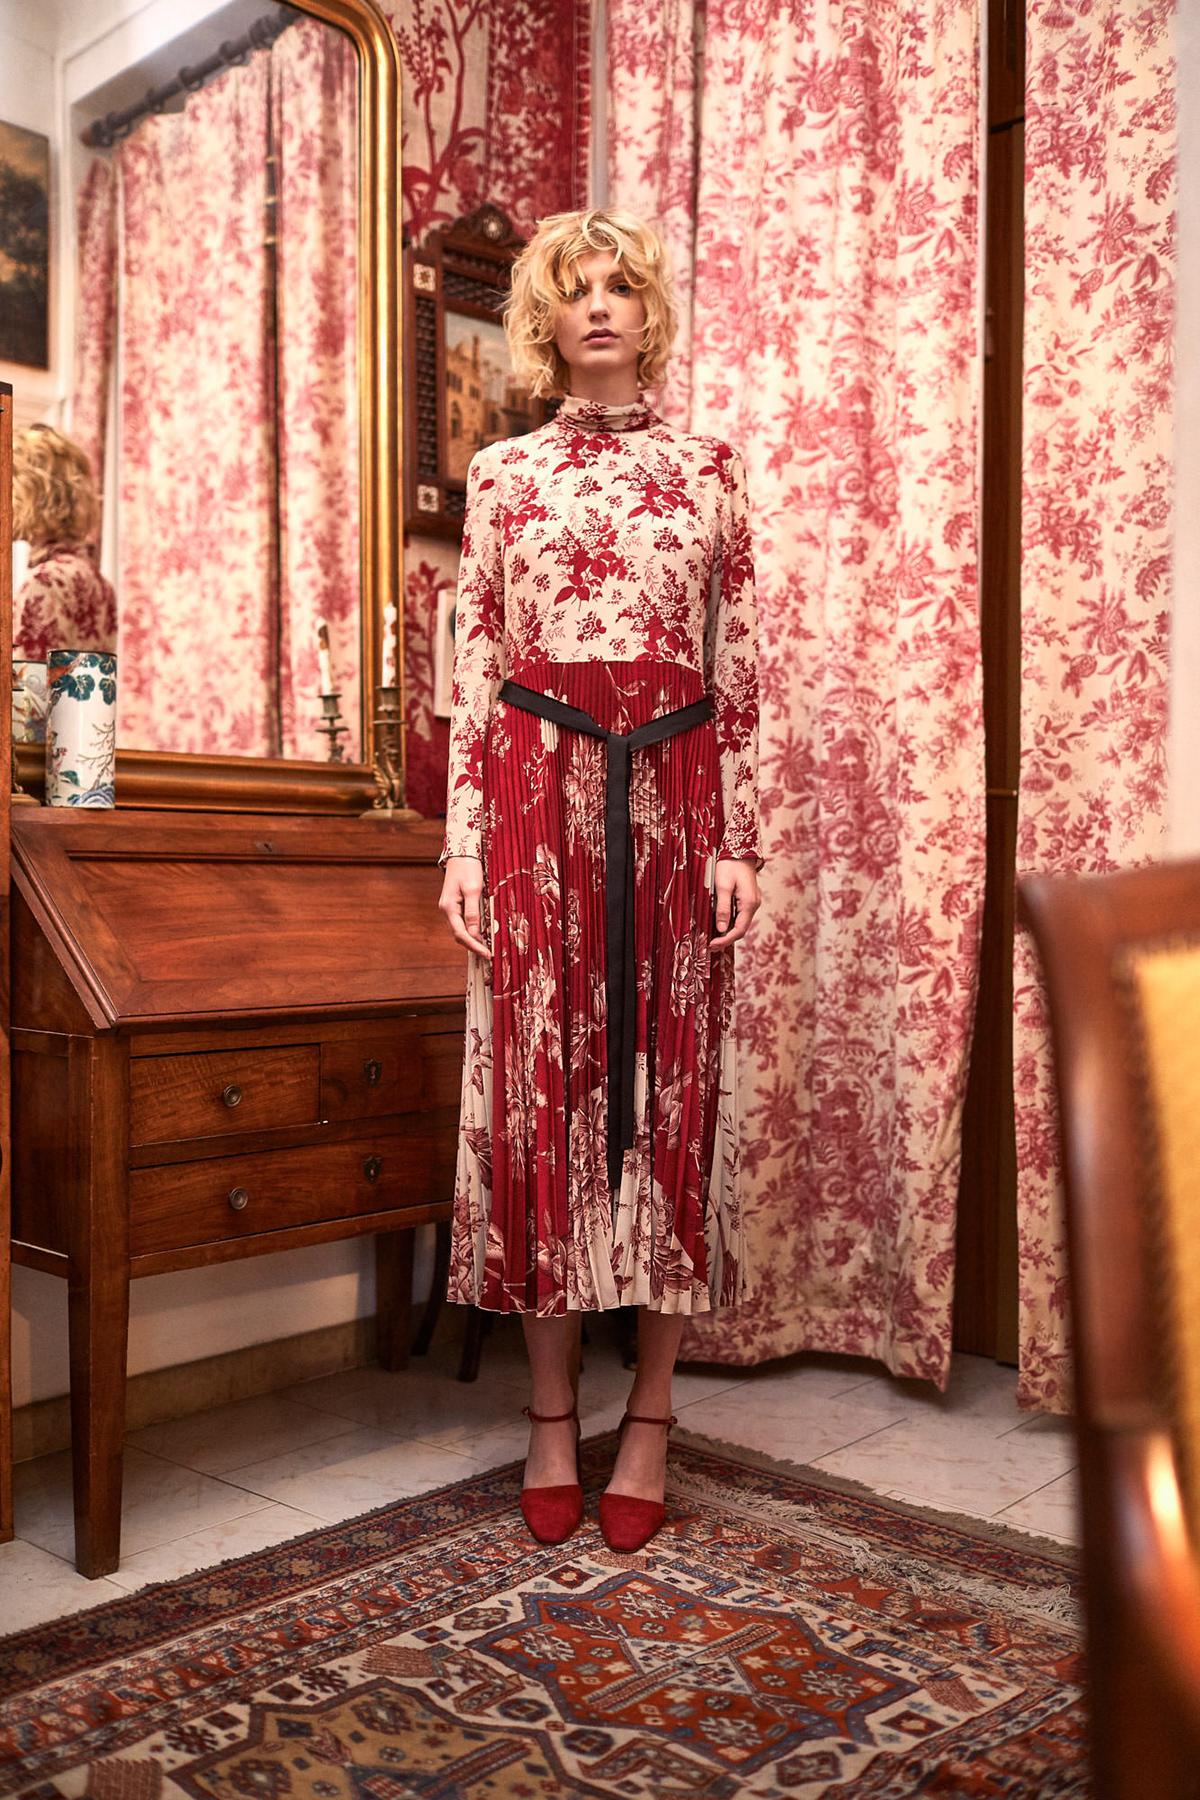 editorial fashion editorial magazine blond model valentino france couture